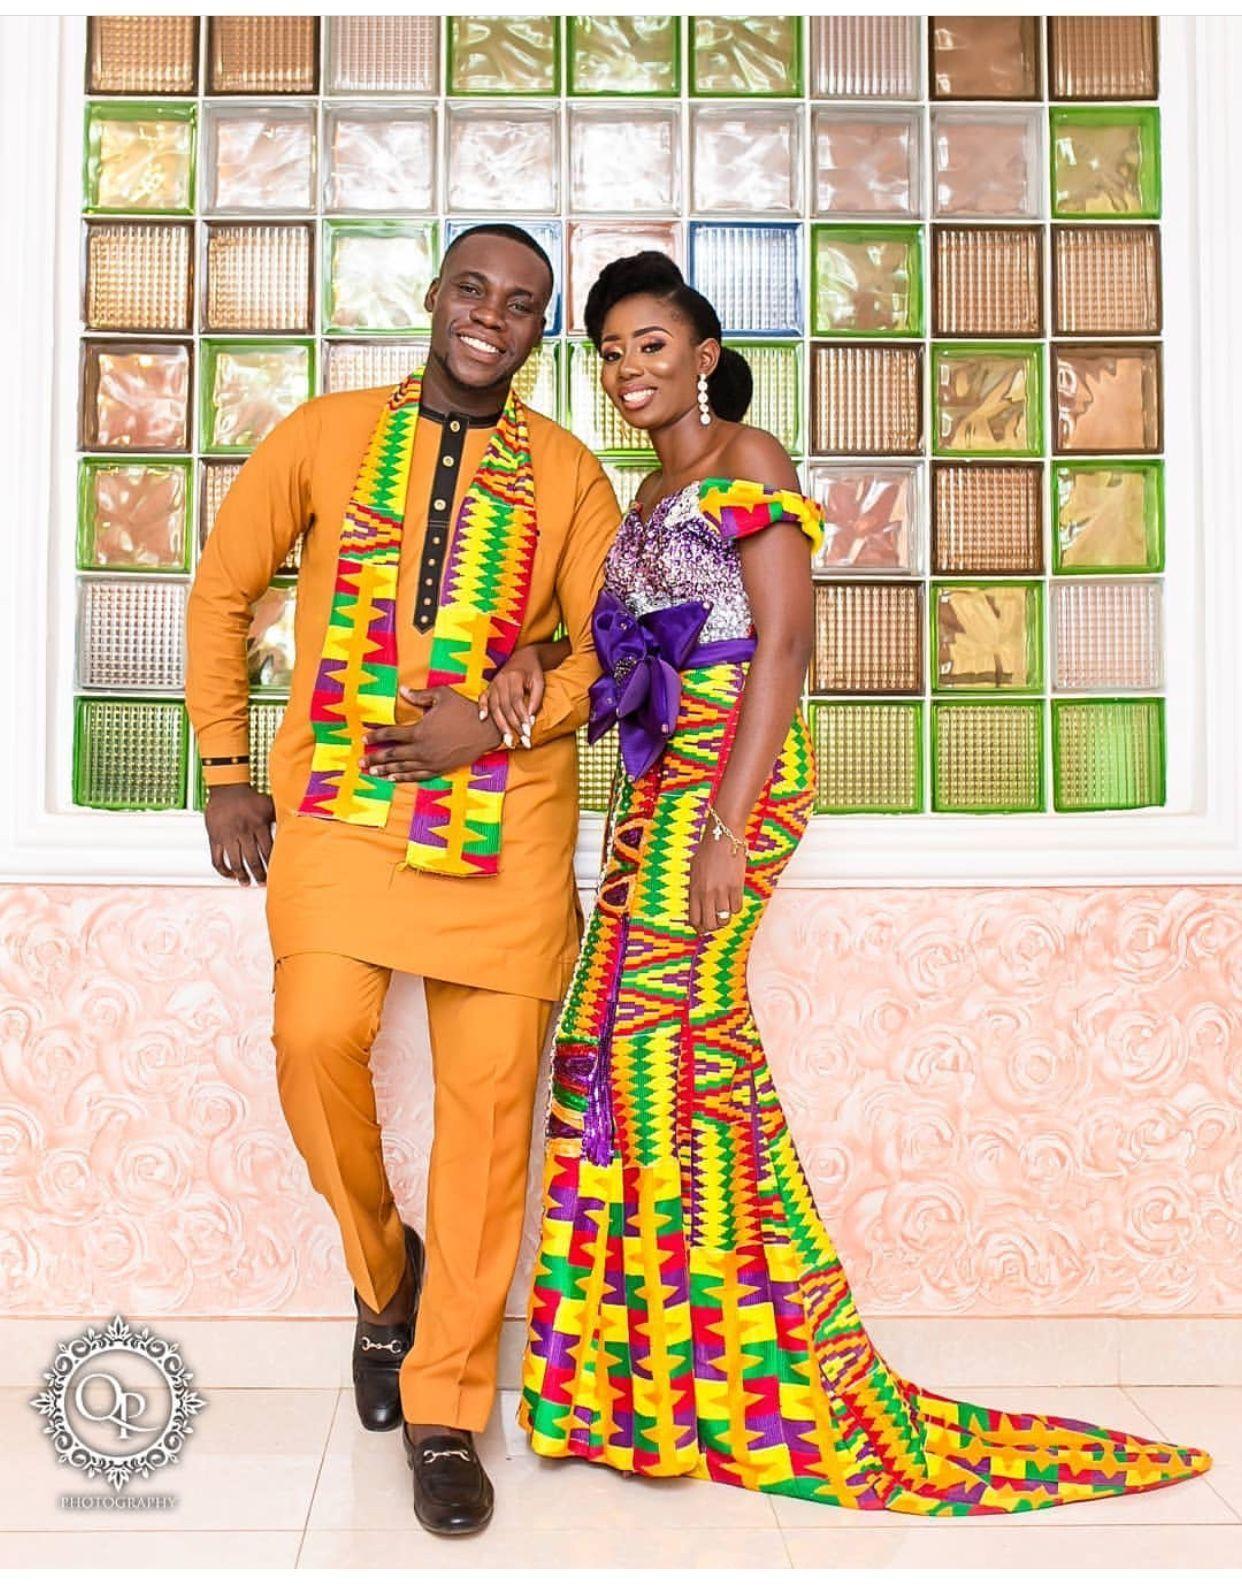 Africanoutfitideas things to wear in pinterest kente